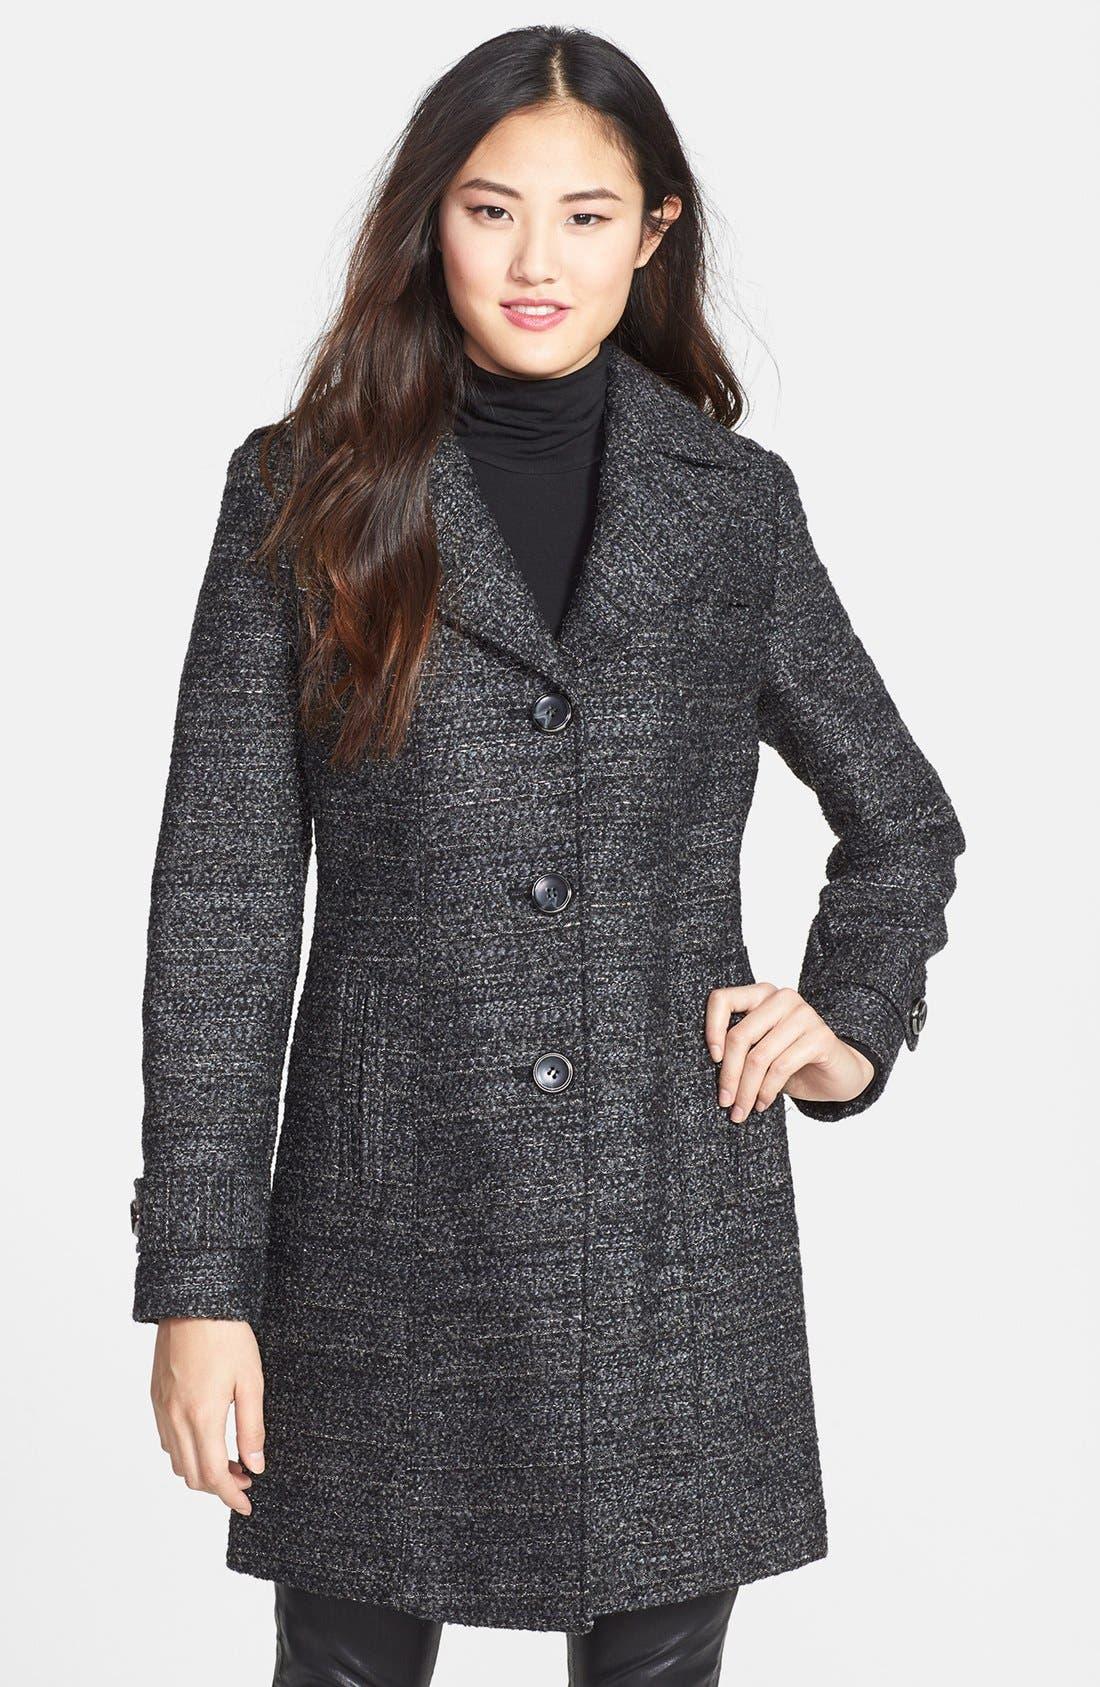 Metallic Tweed Walking Coat,                             Main thumbnail 1, color,                             Black